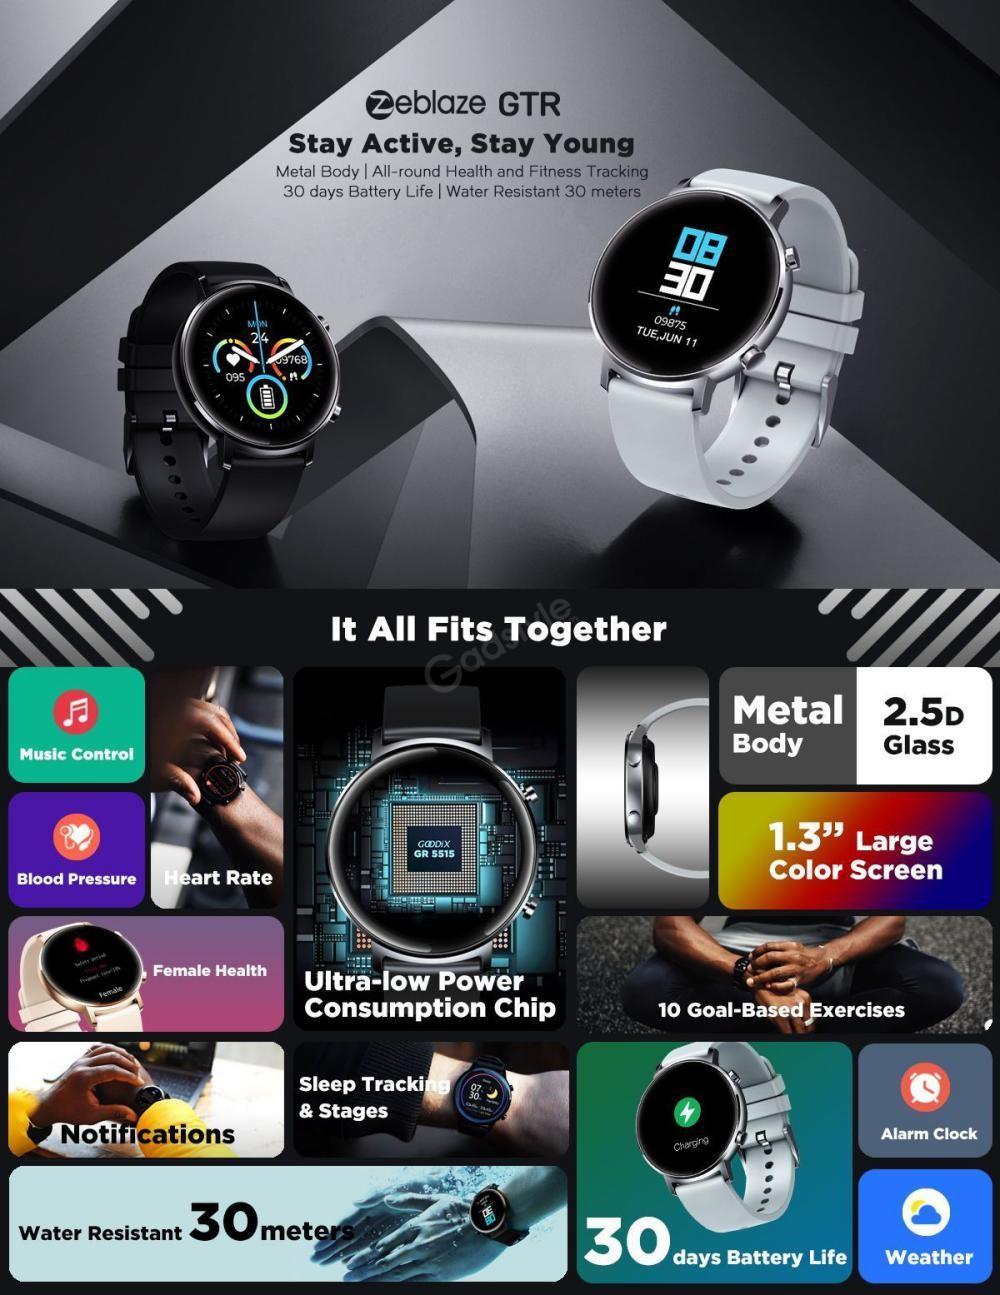 Zeblaze Gtr Curved Screen Smart Watch (3)